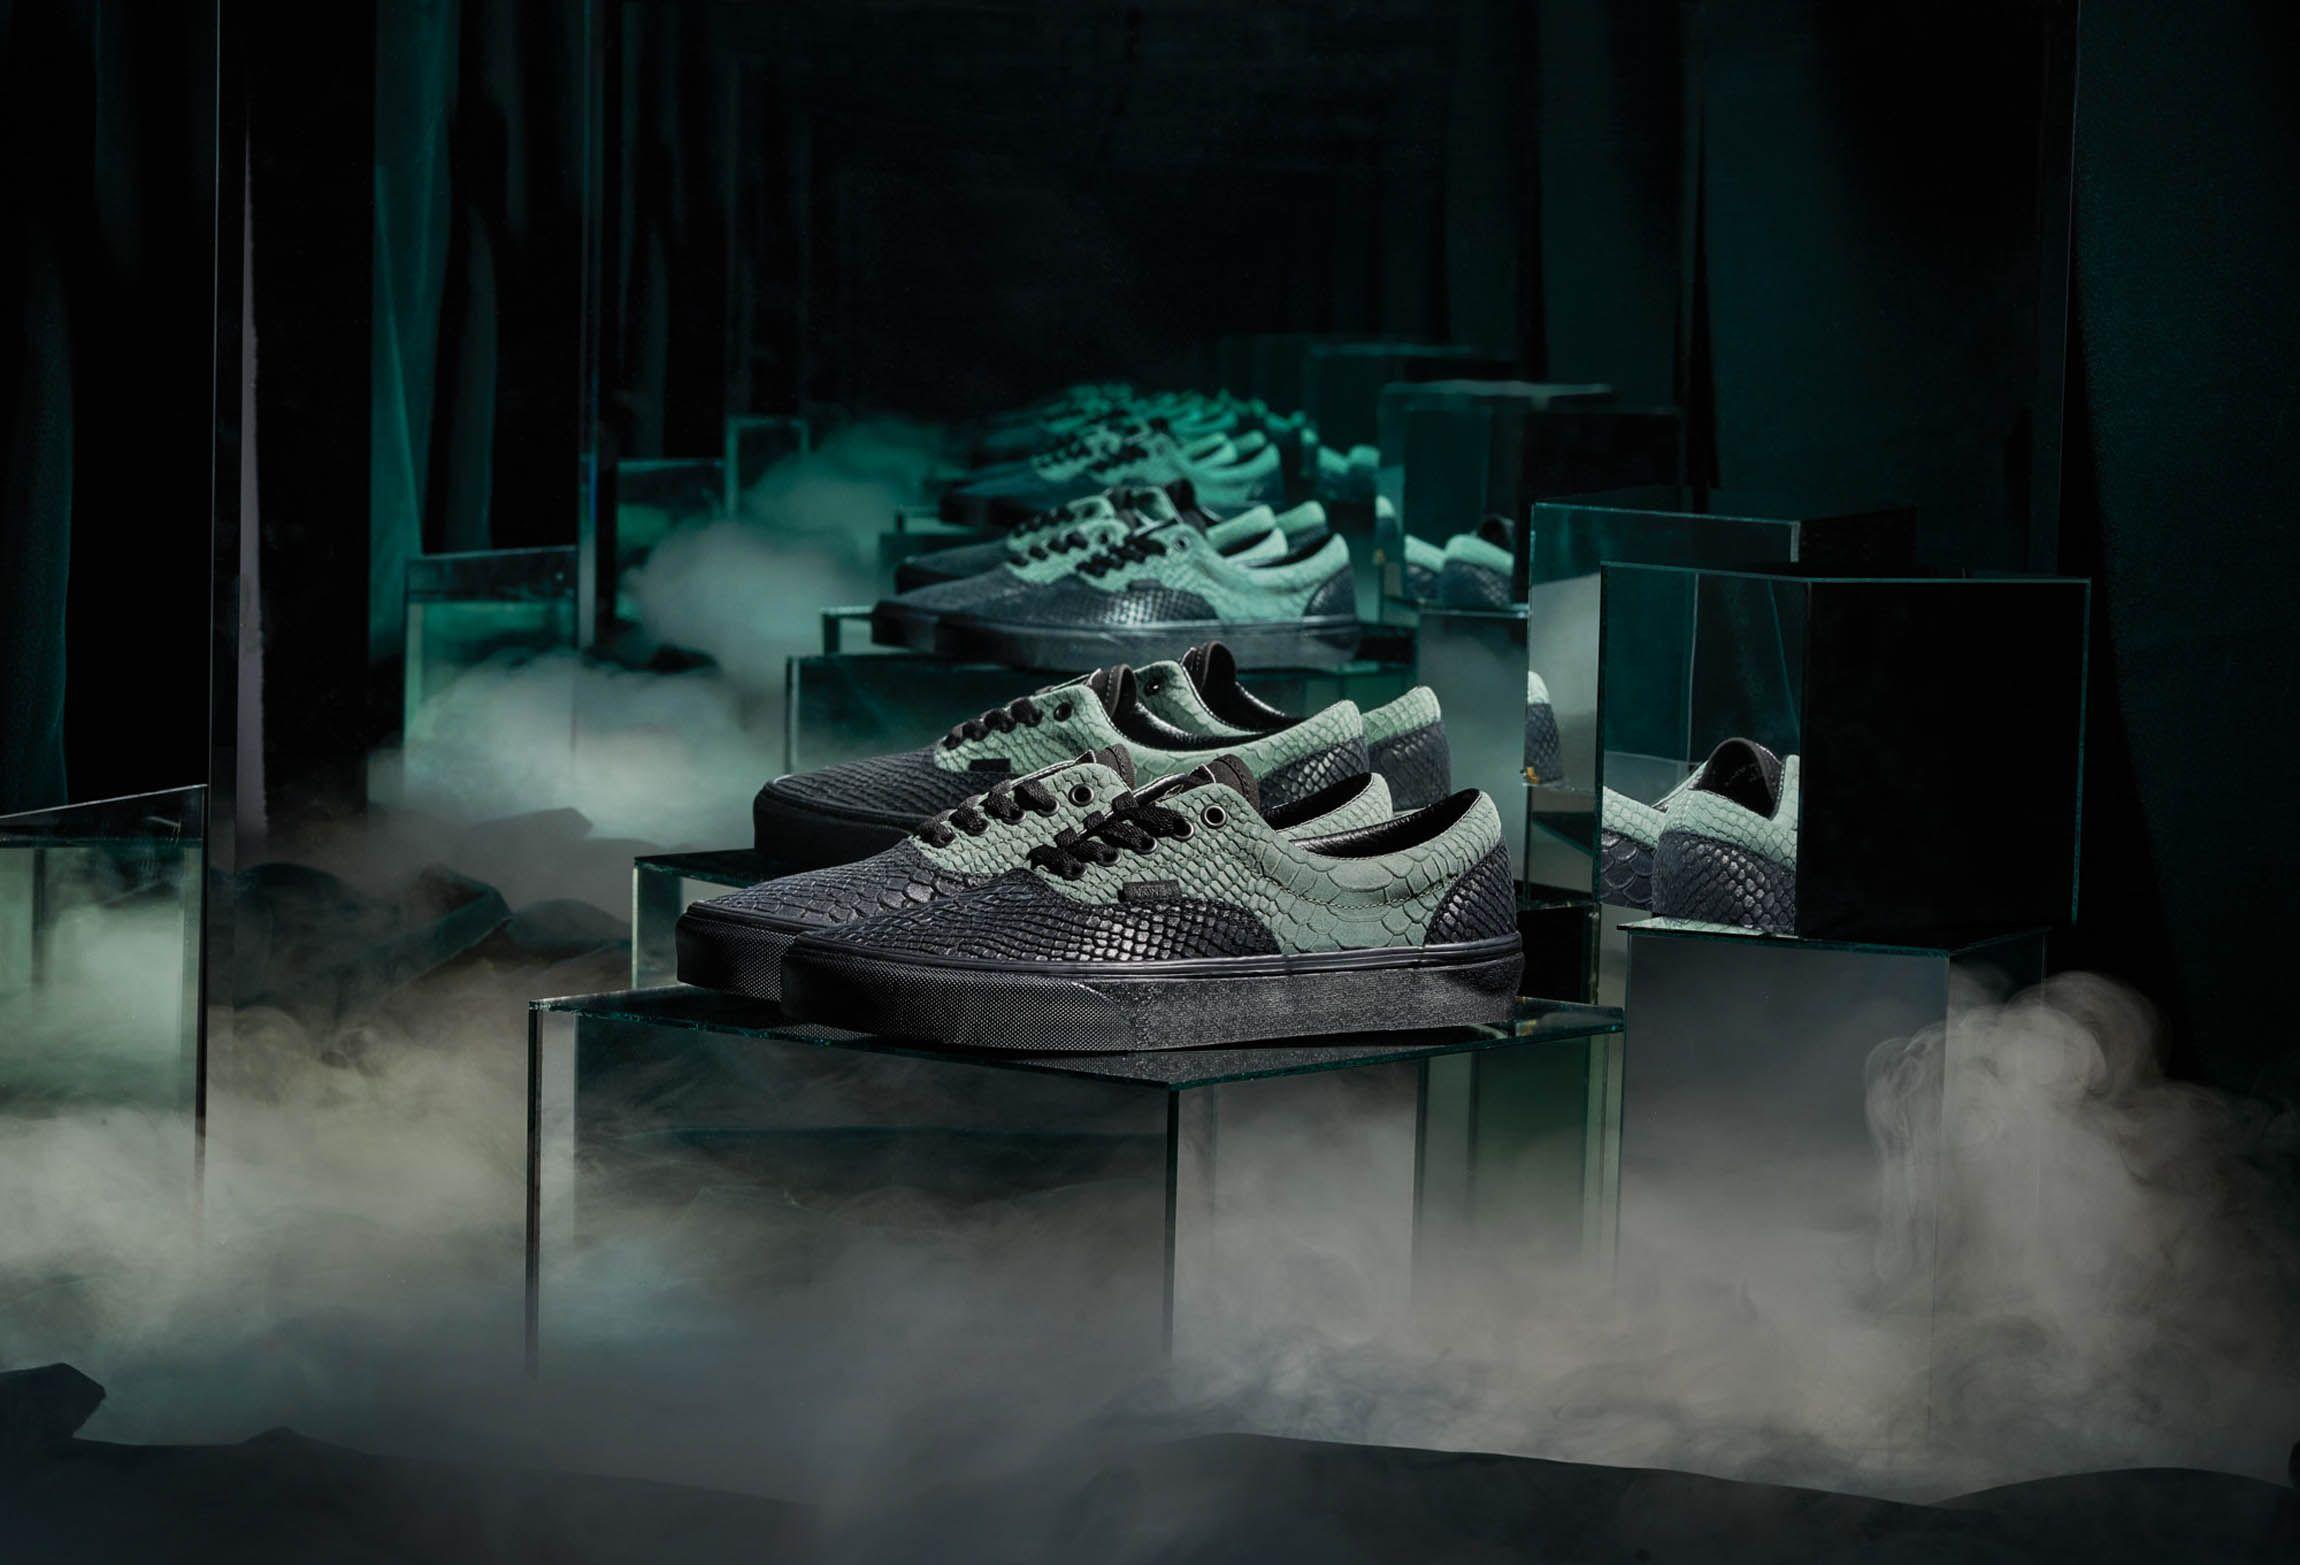 Vans x Harry Potter Collaboration 2019 Full Lookbook - Best